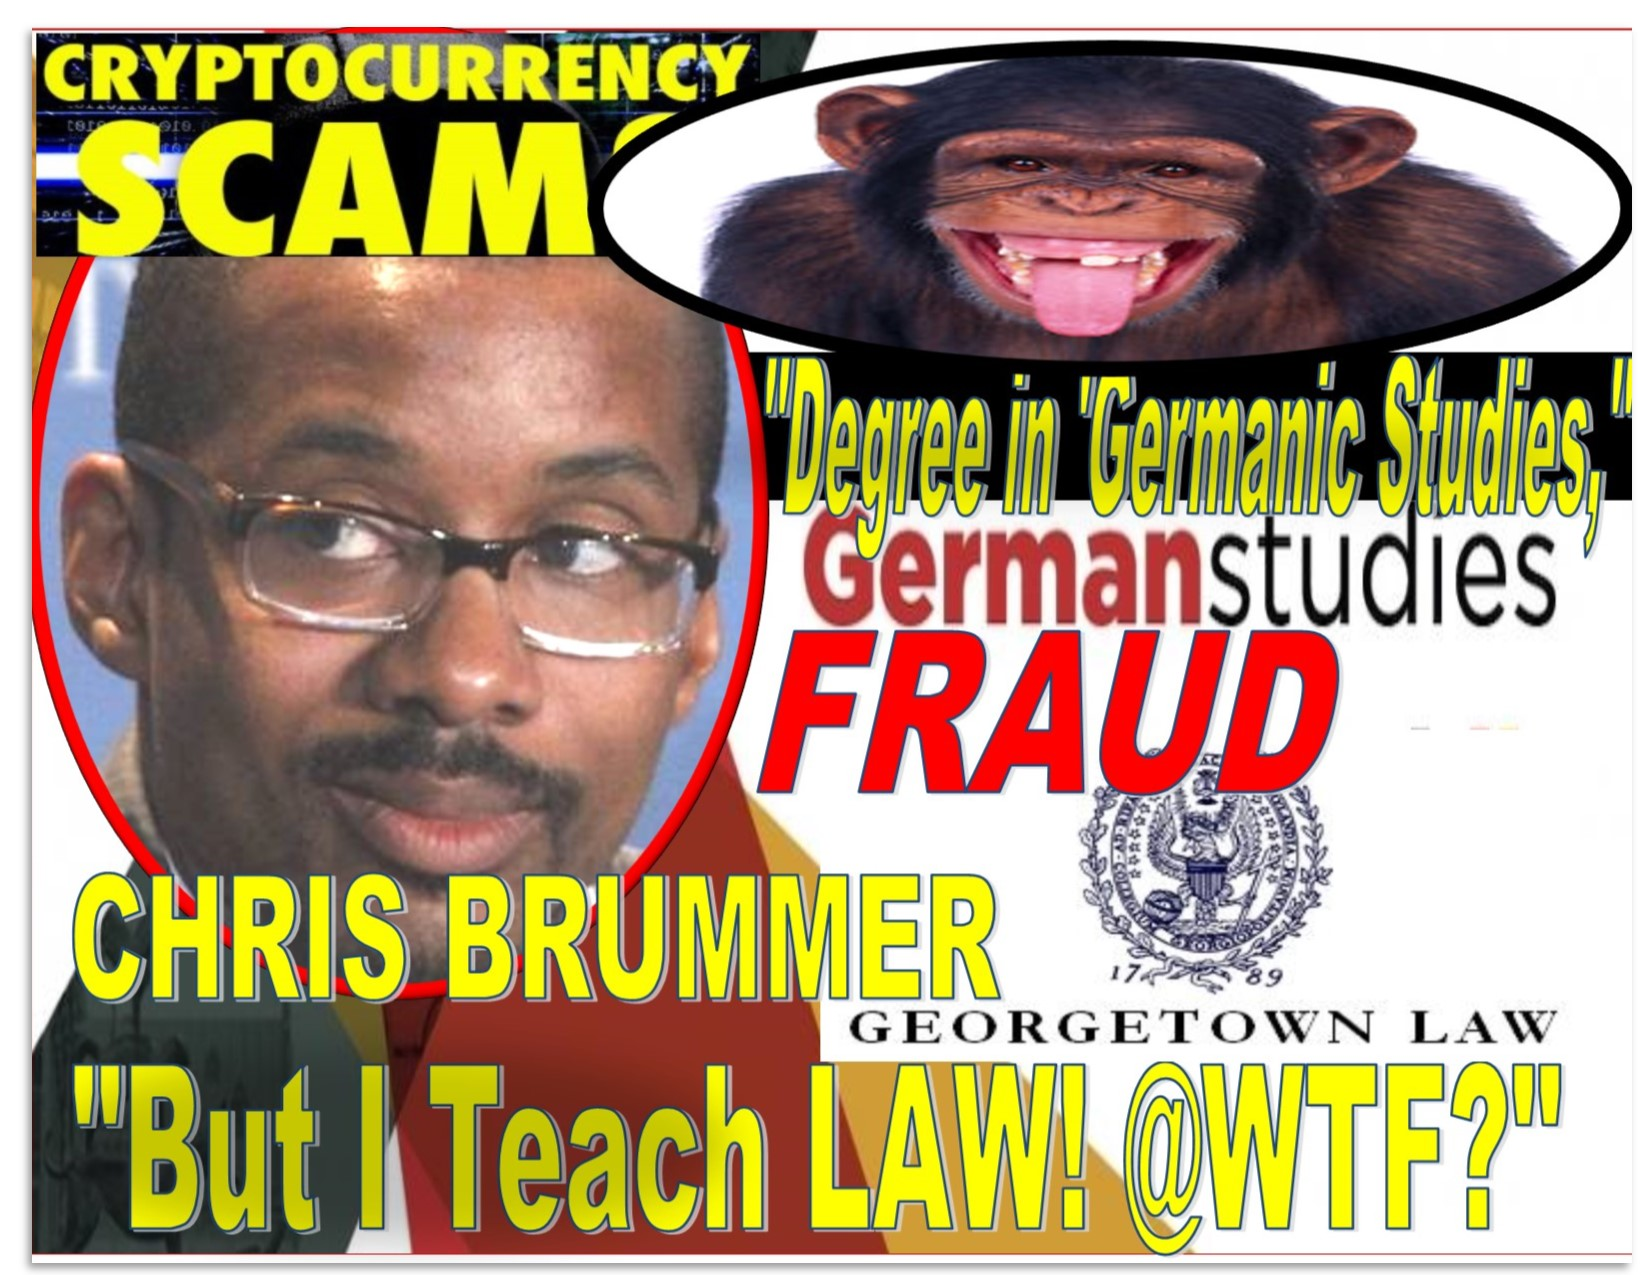 RACHEL LOKO, SEC, Chris Brummer, Georgetown Law Center, Professor, Cryptocurrency, Germanic Studies, Daren Garcia, Nicole Gueron, Ashleigh Hunt, lawyer, fraud